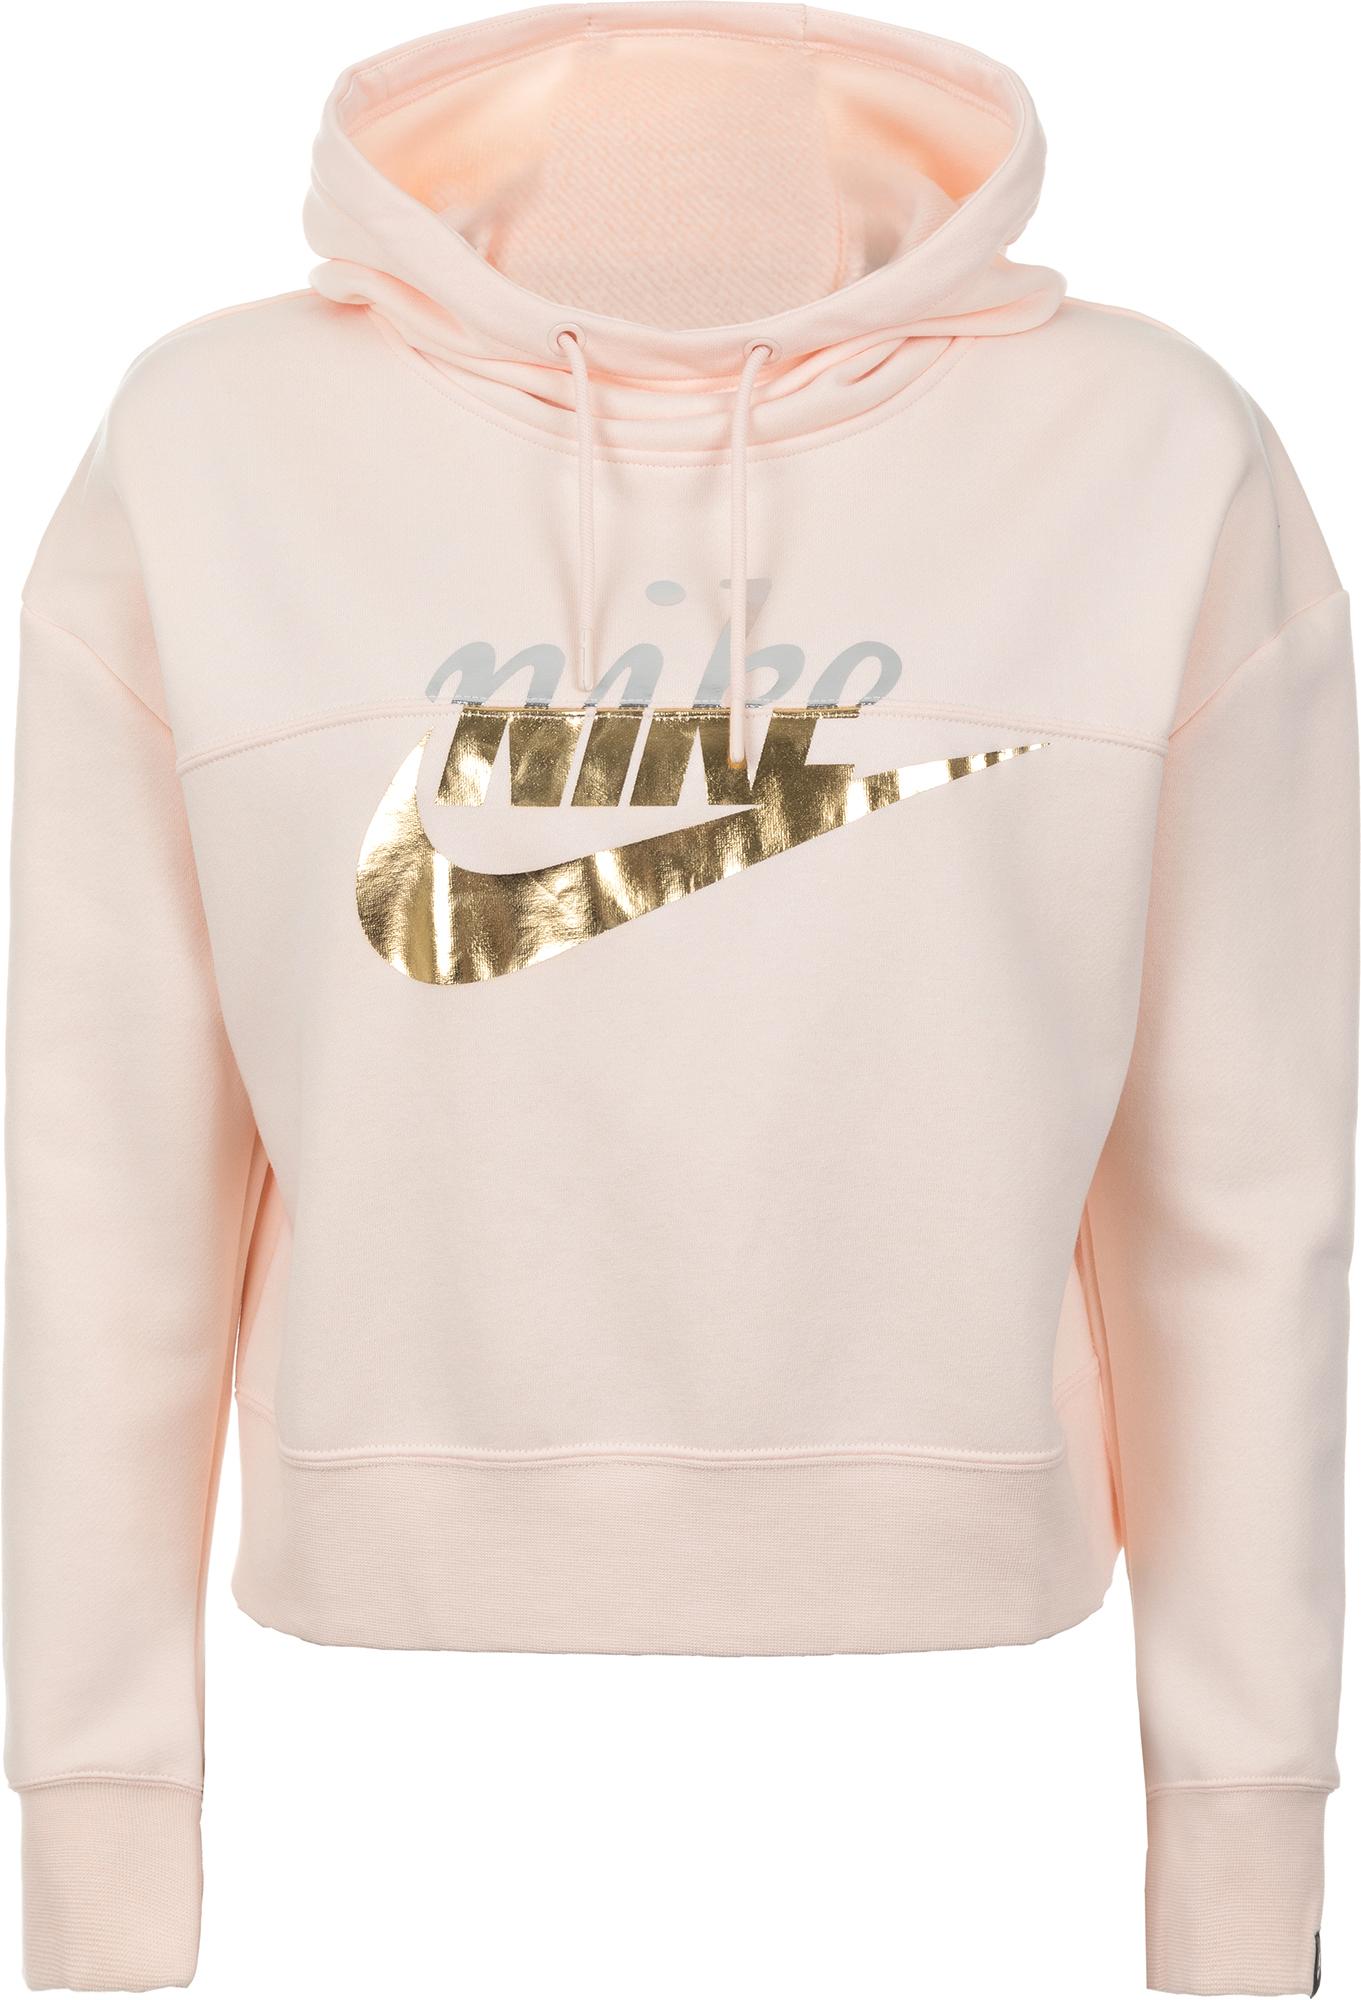 Nike Джемпер женский Nike Sportswear Rally, размер 46-48